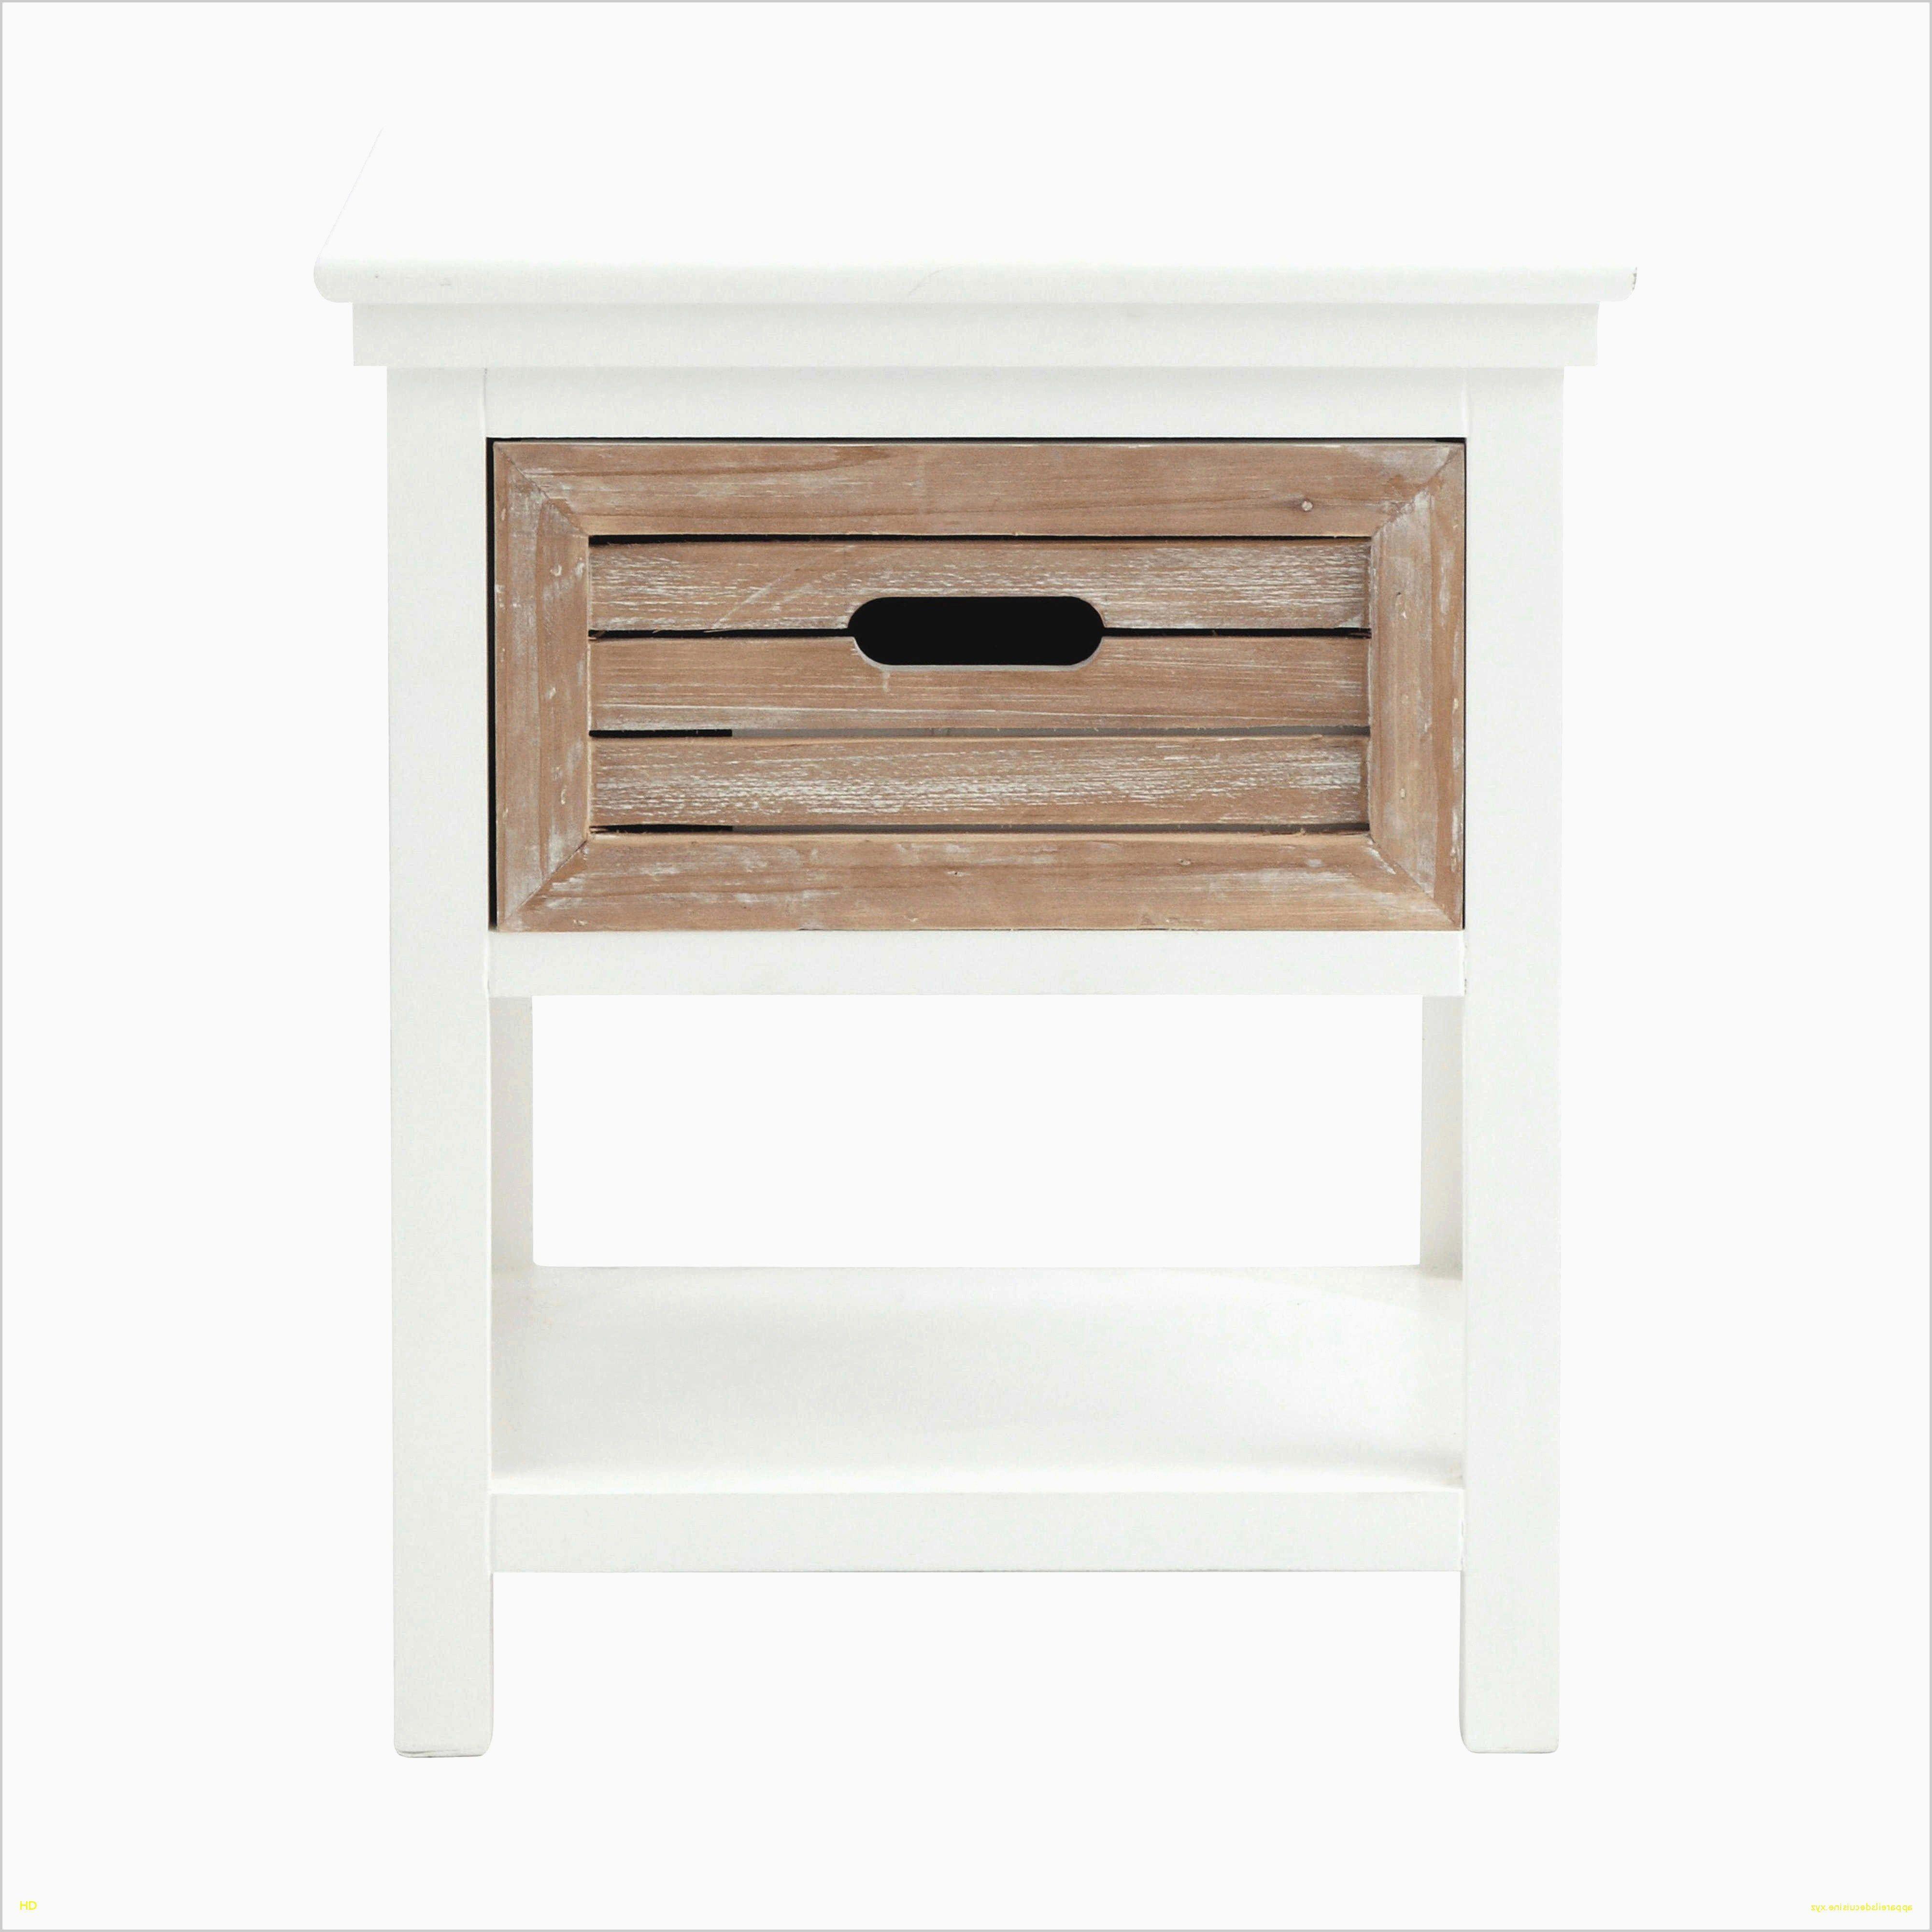 meilleur Ikea Bureau assis Debout